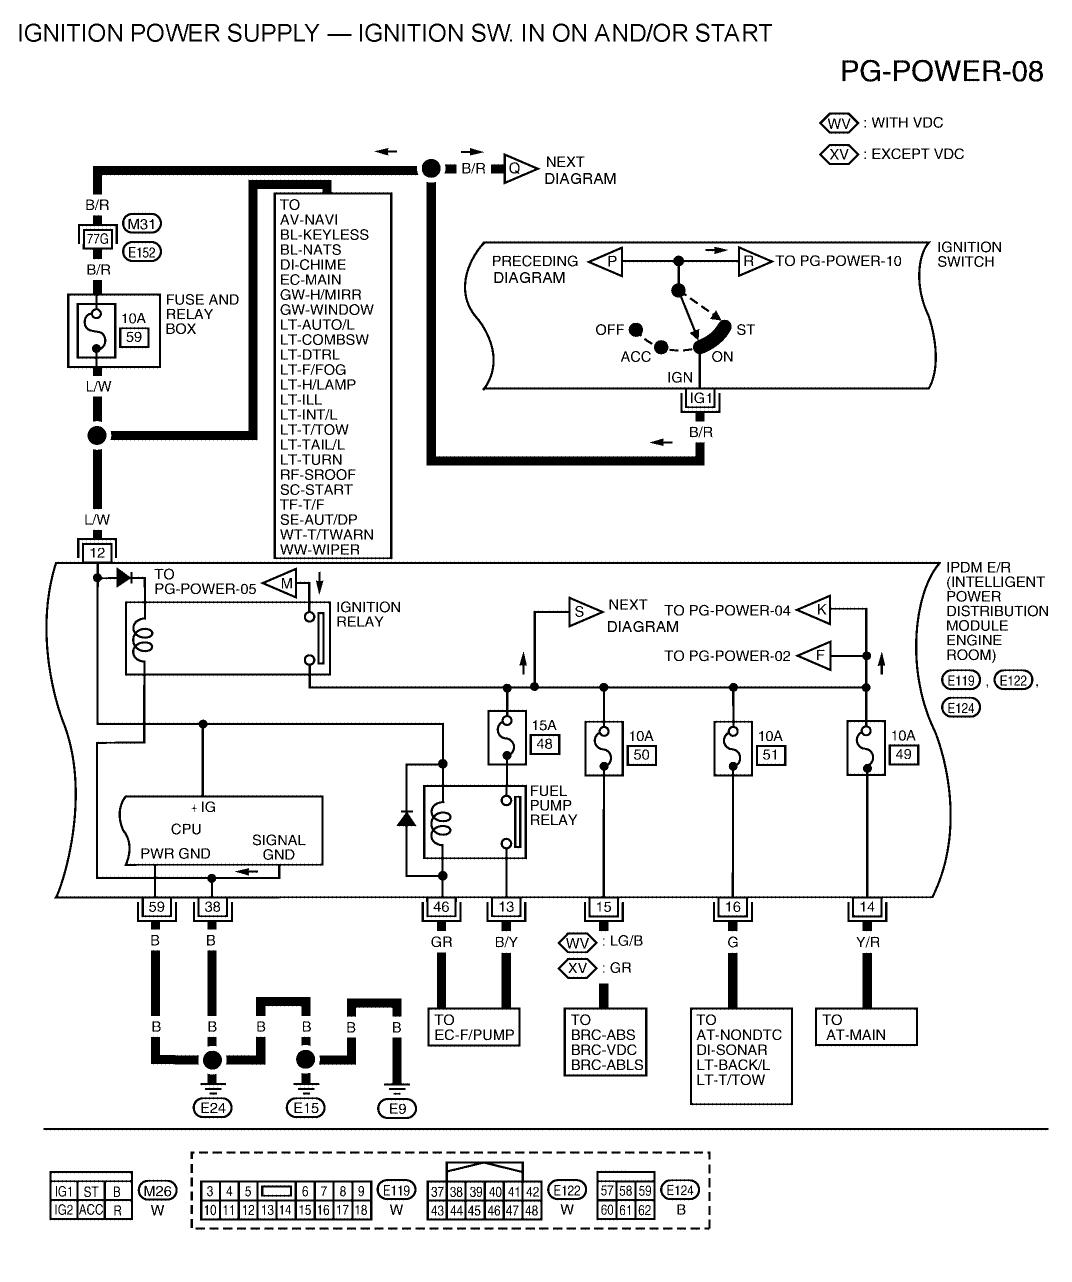 2007 nissan armada wiring diagram - 2013 electra glide wiring diagram -  piooner-radios.wiringdol.jeanjaures37.fr  wiring diagram resource